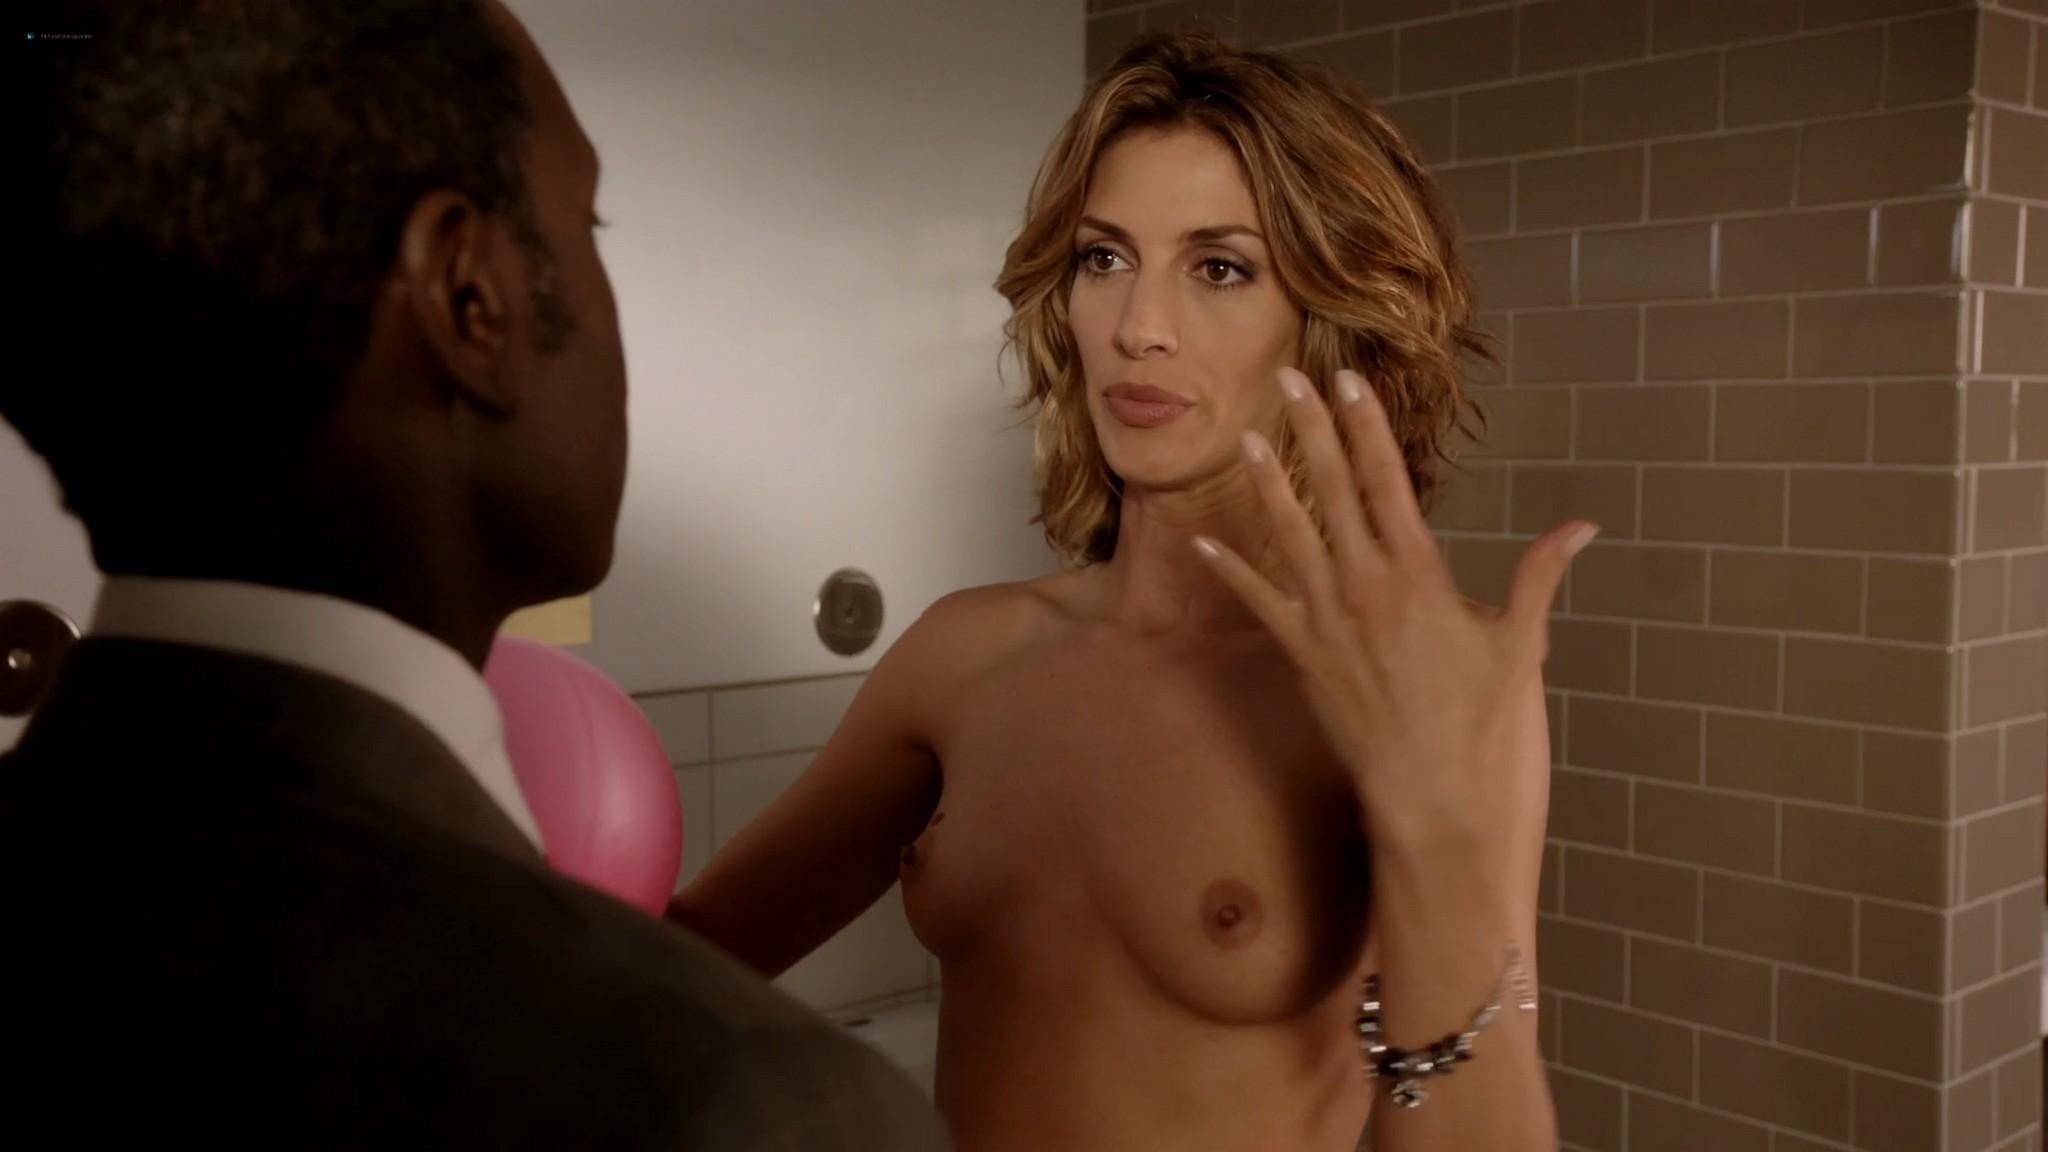 Megalyn Echikunwoke nude topless and Dawn Olivieri nude too House of Lies 2012 s1e7 1080p Web 9